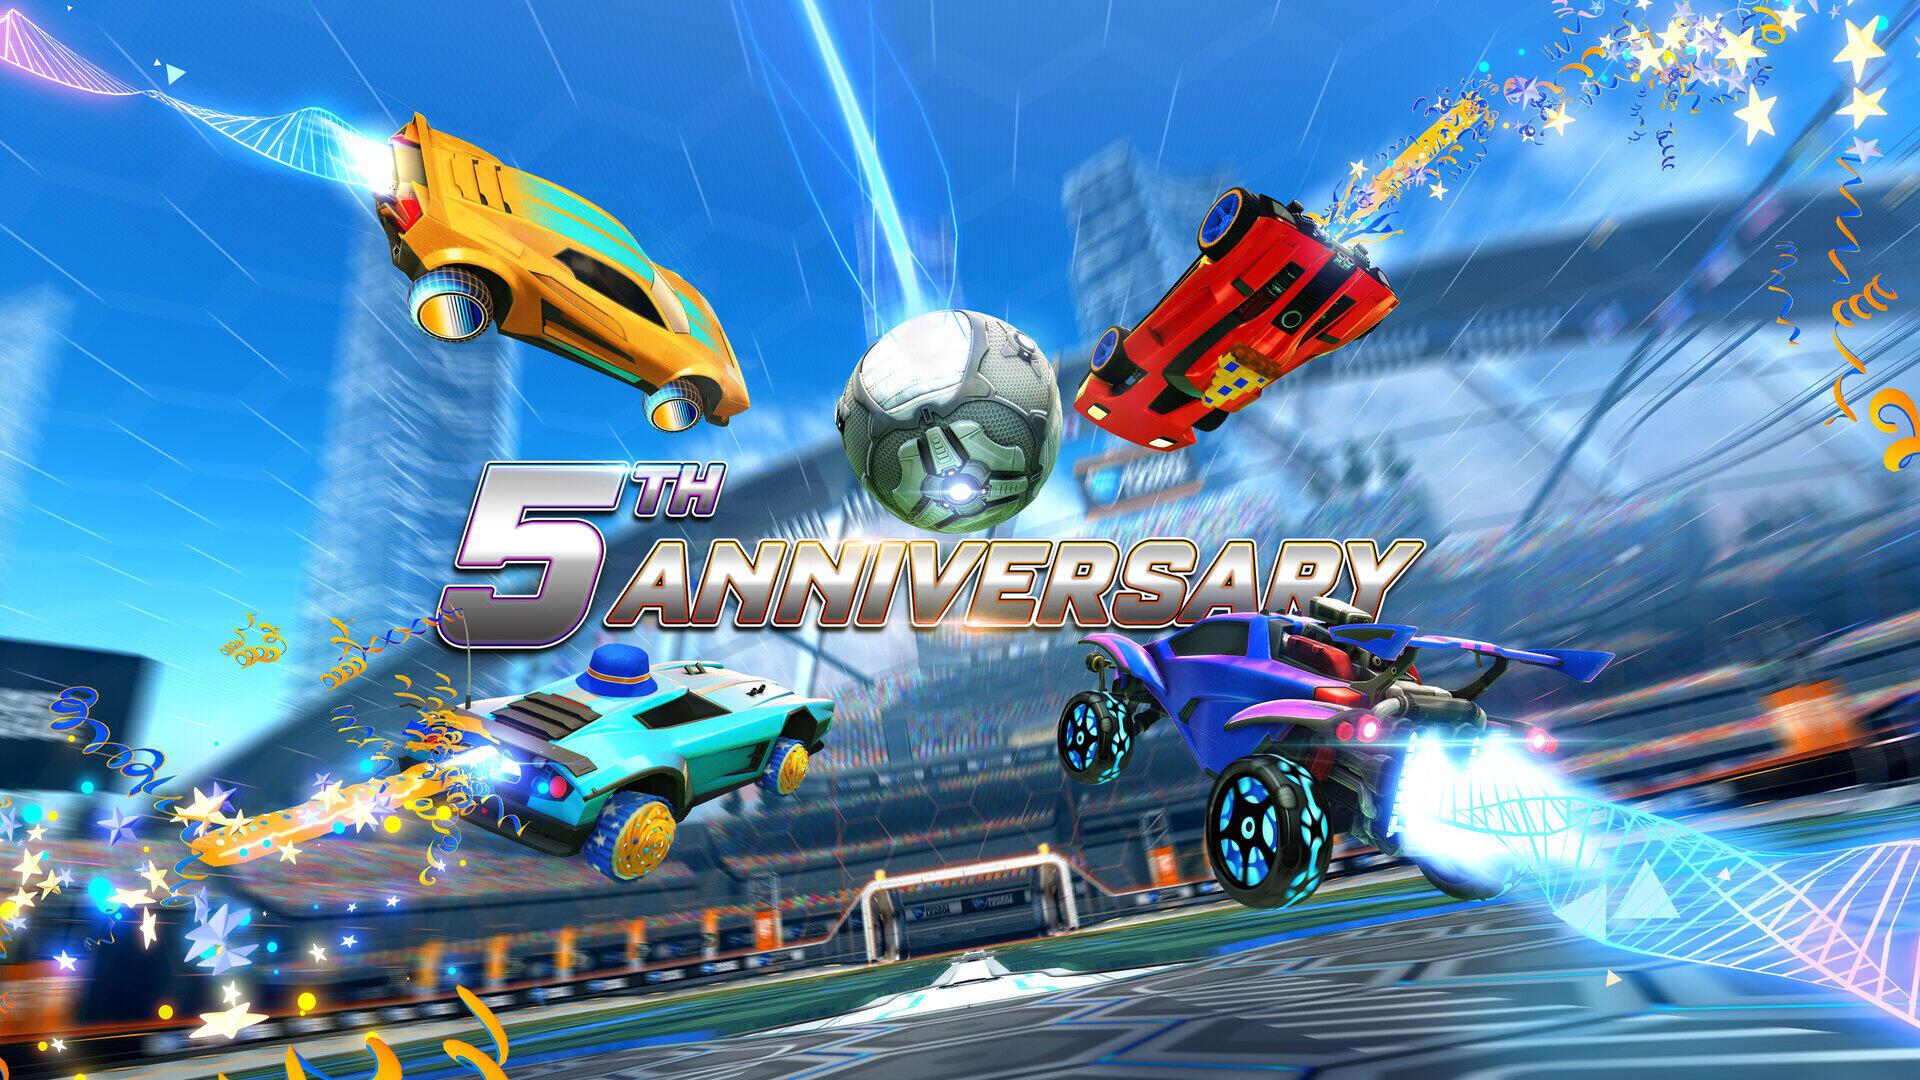 RL 5th anniversary